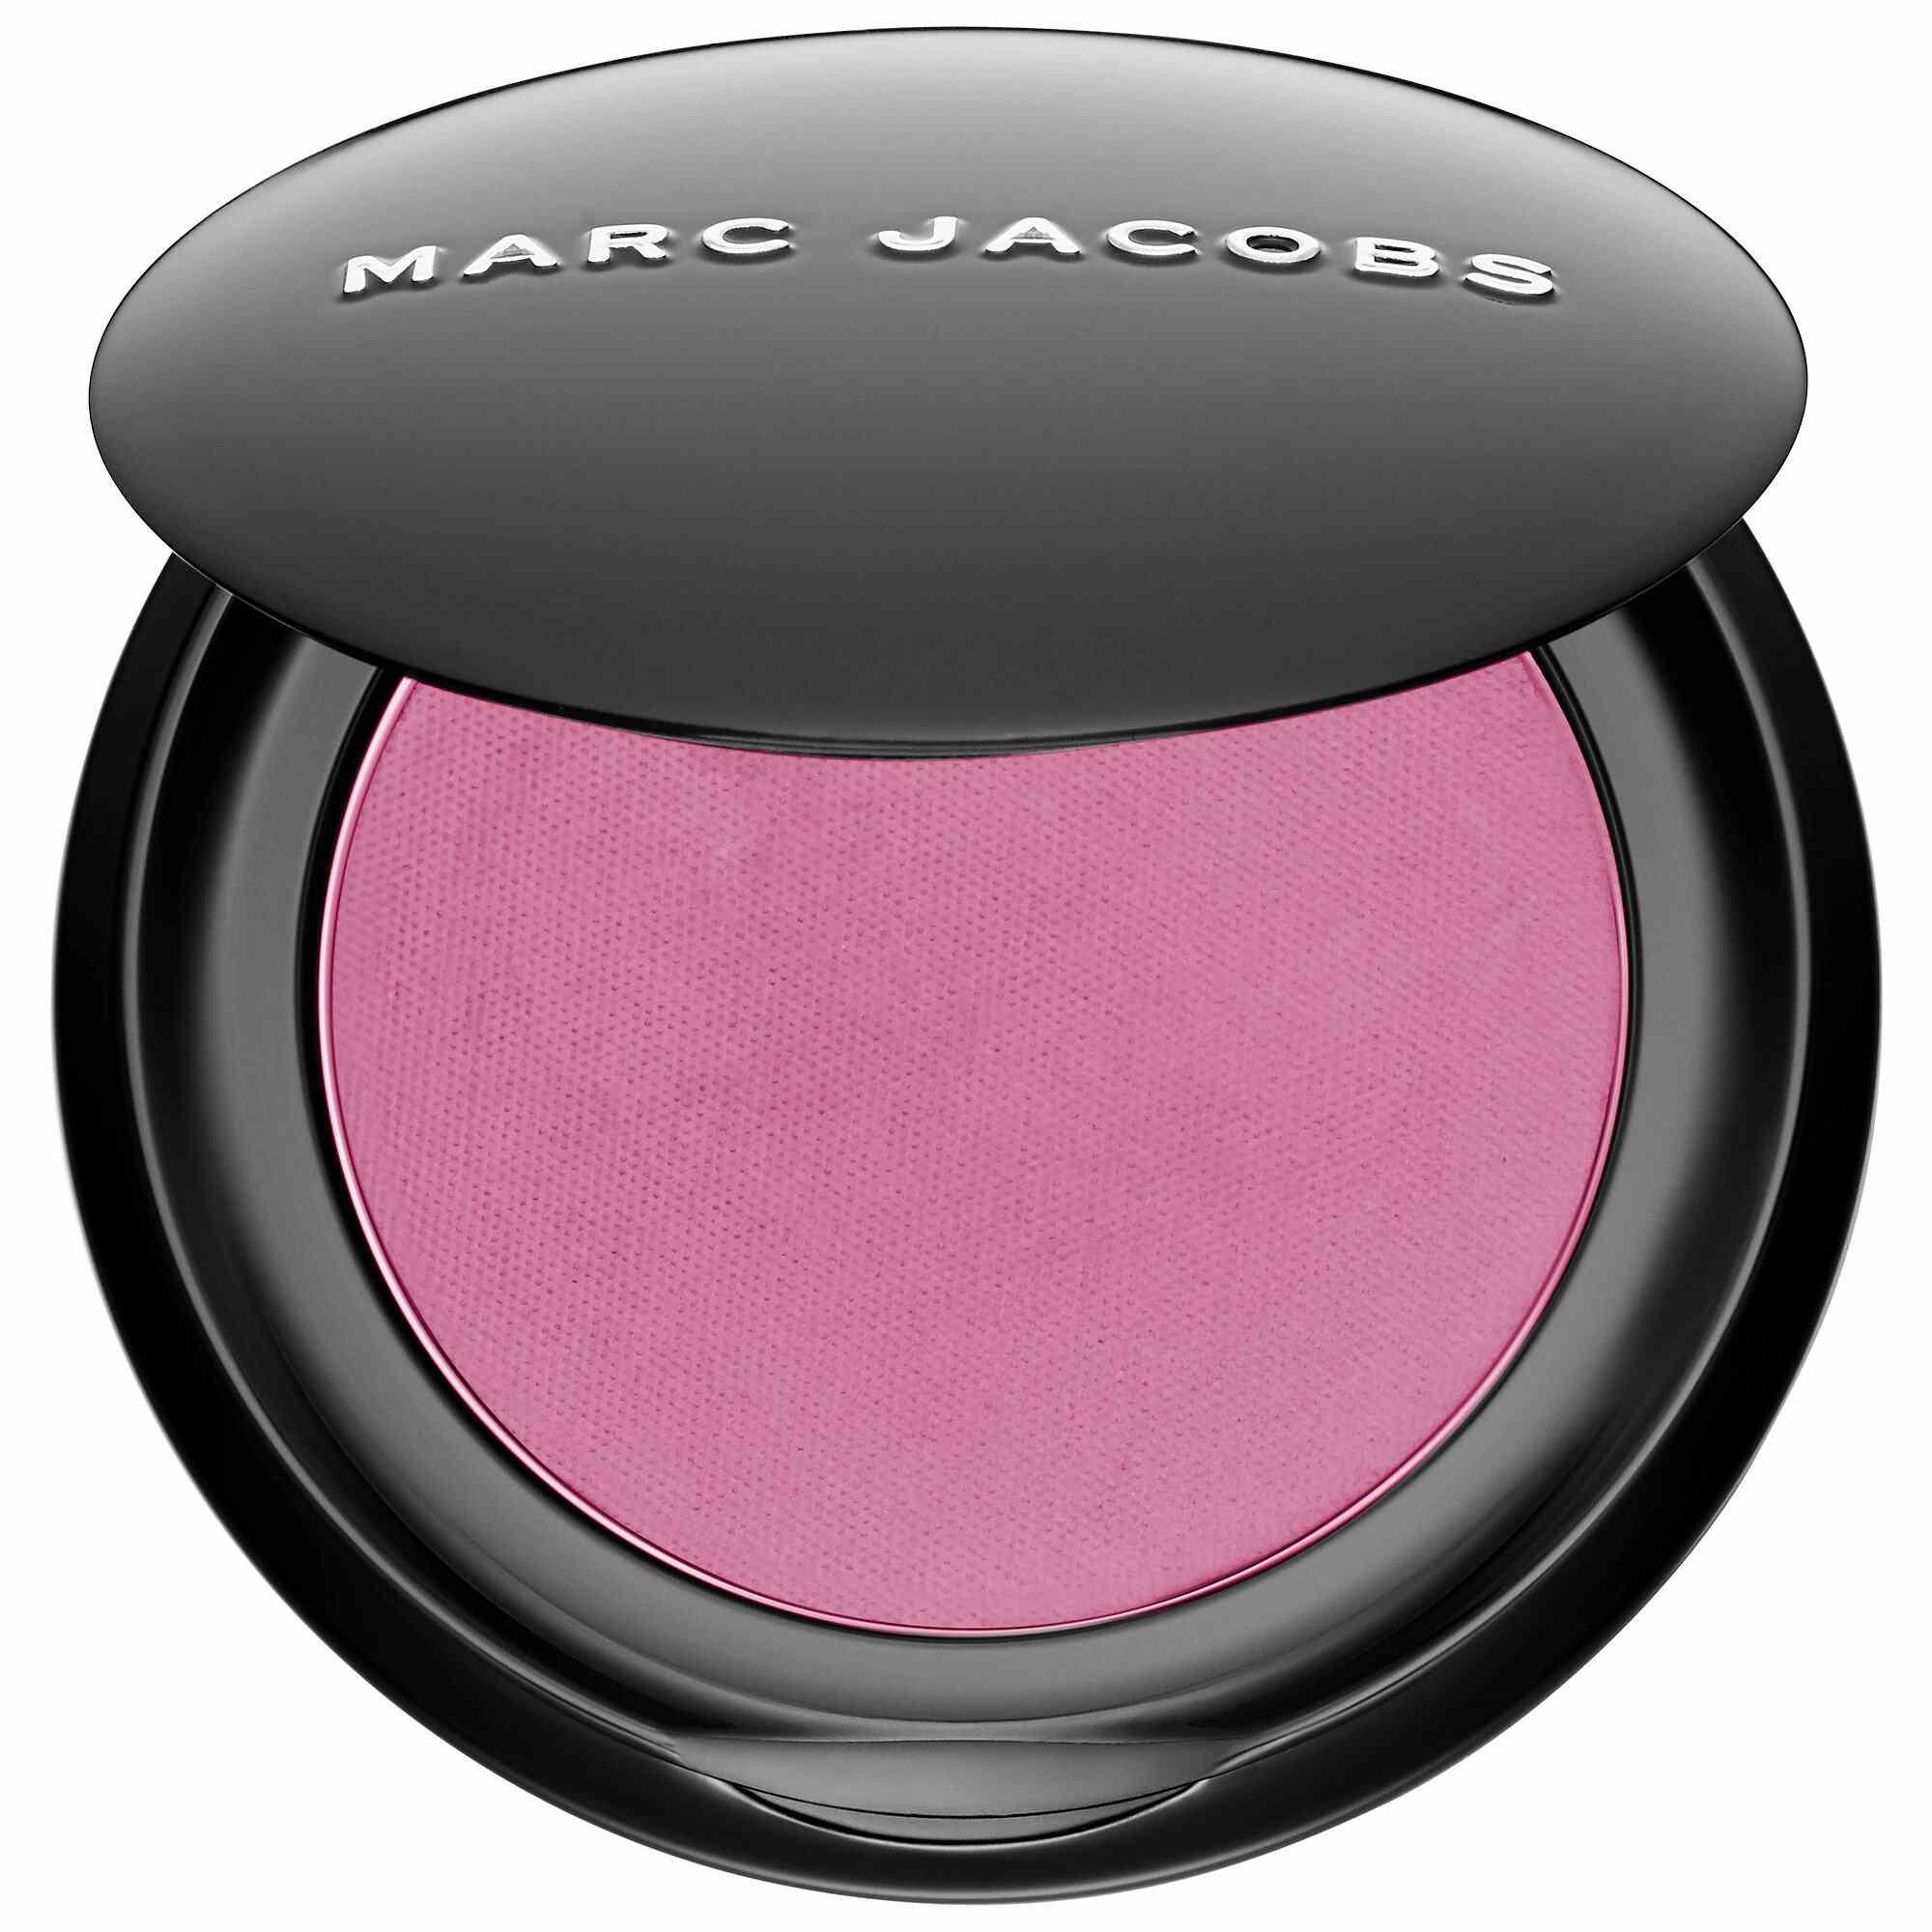 Marc Jacobs Beauty O!Mega Shadow in 630 RO!SE